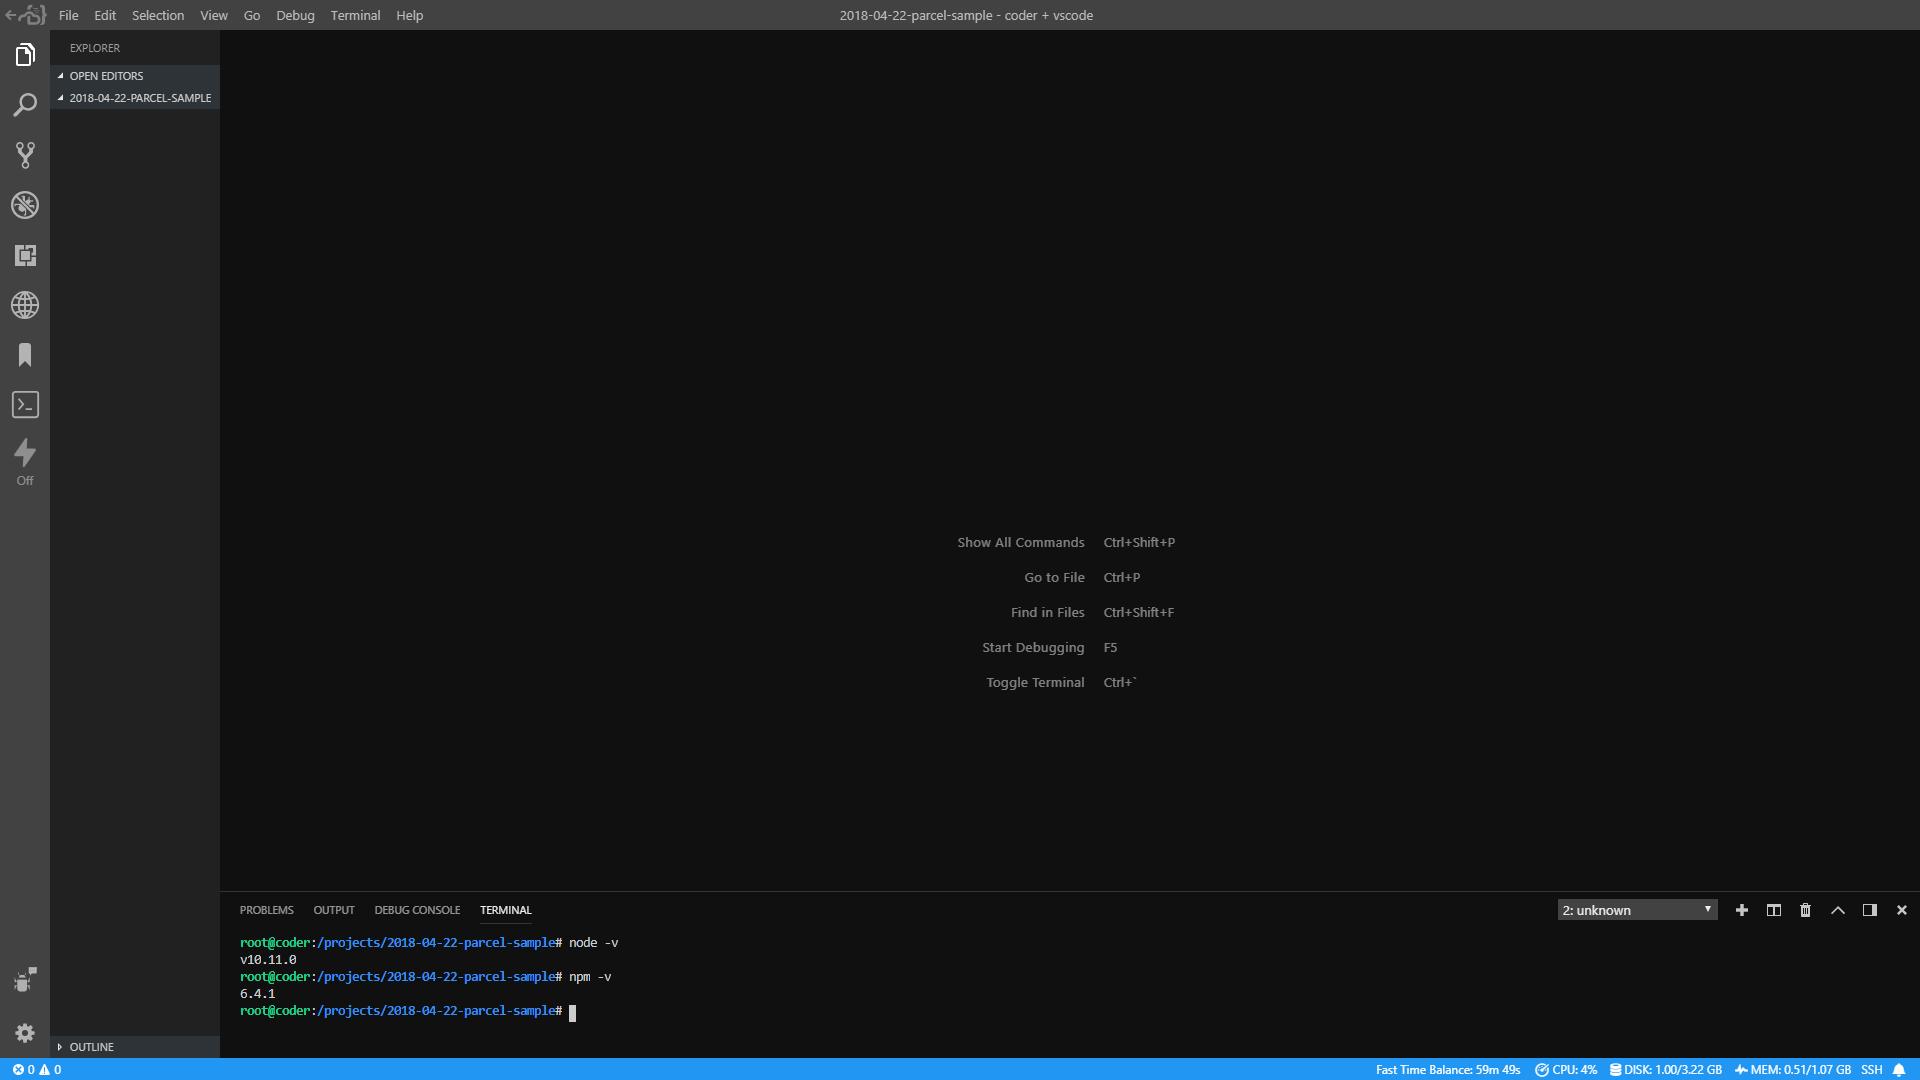 7_coder.com_MegaBlackLabel_2018-04-22-parcel-sample(FHD).png